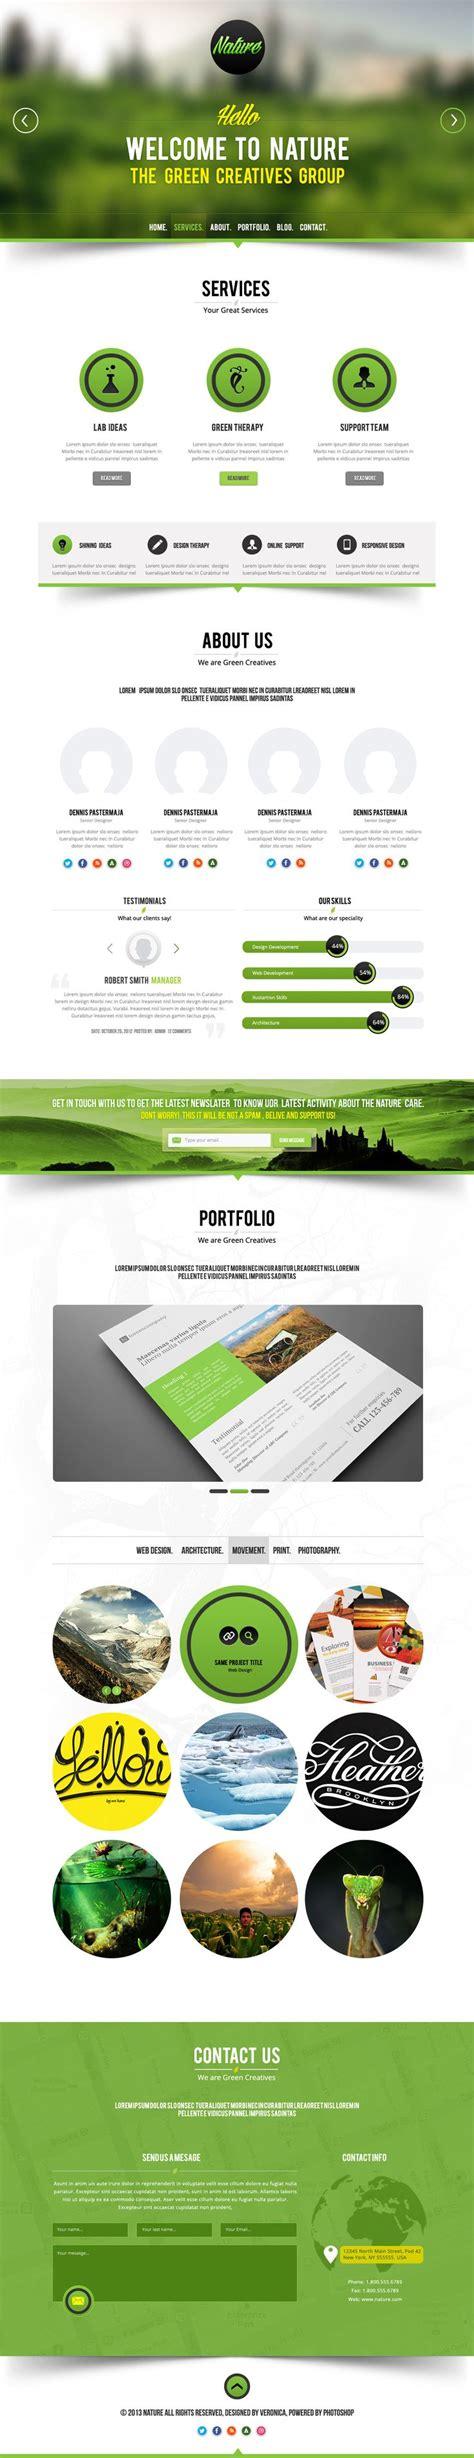 web design layout statistics we provide data mining ebay templates web scraping